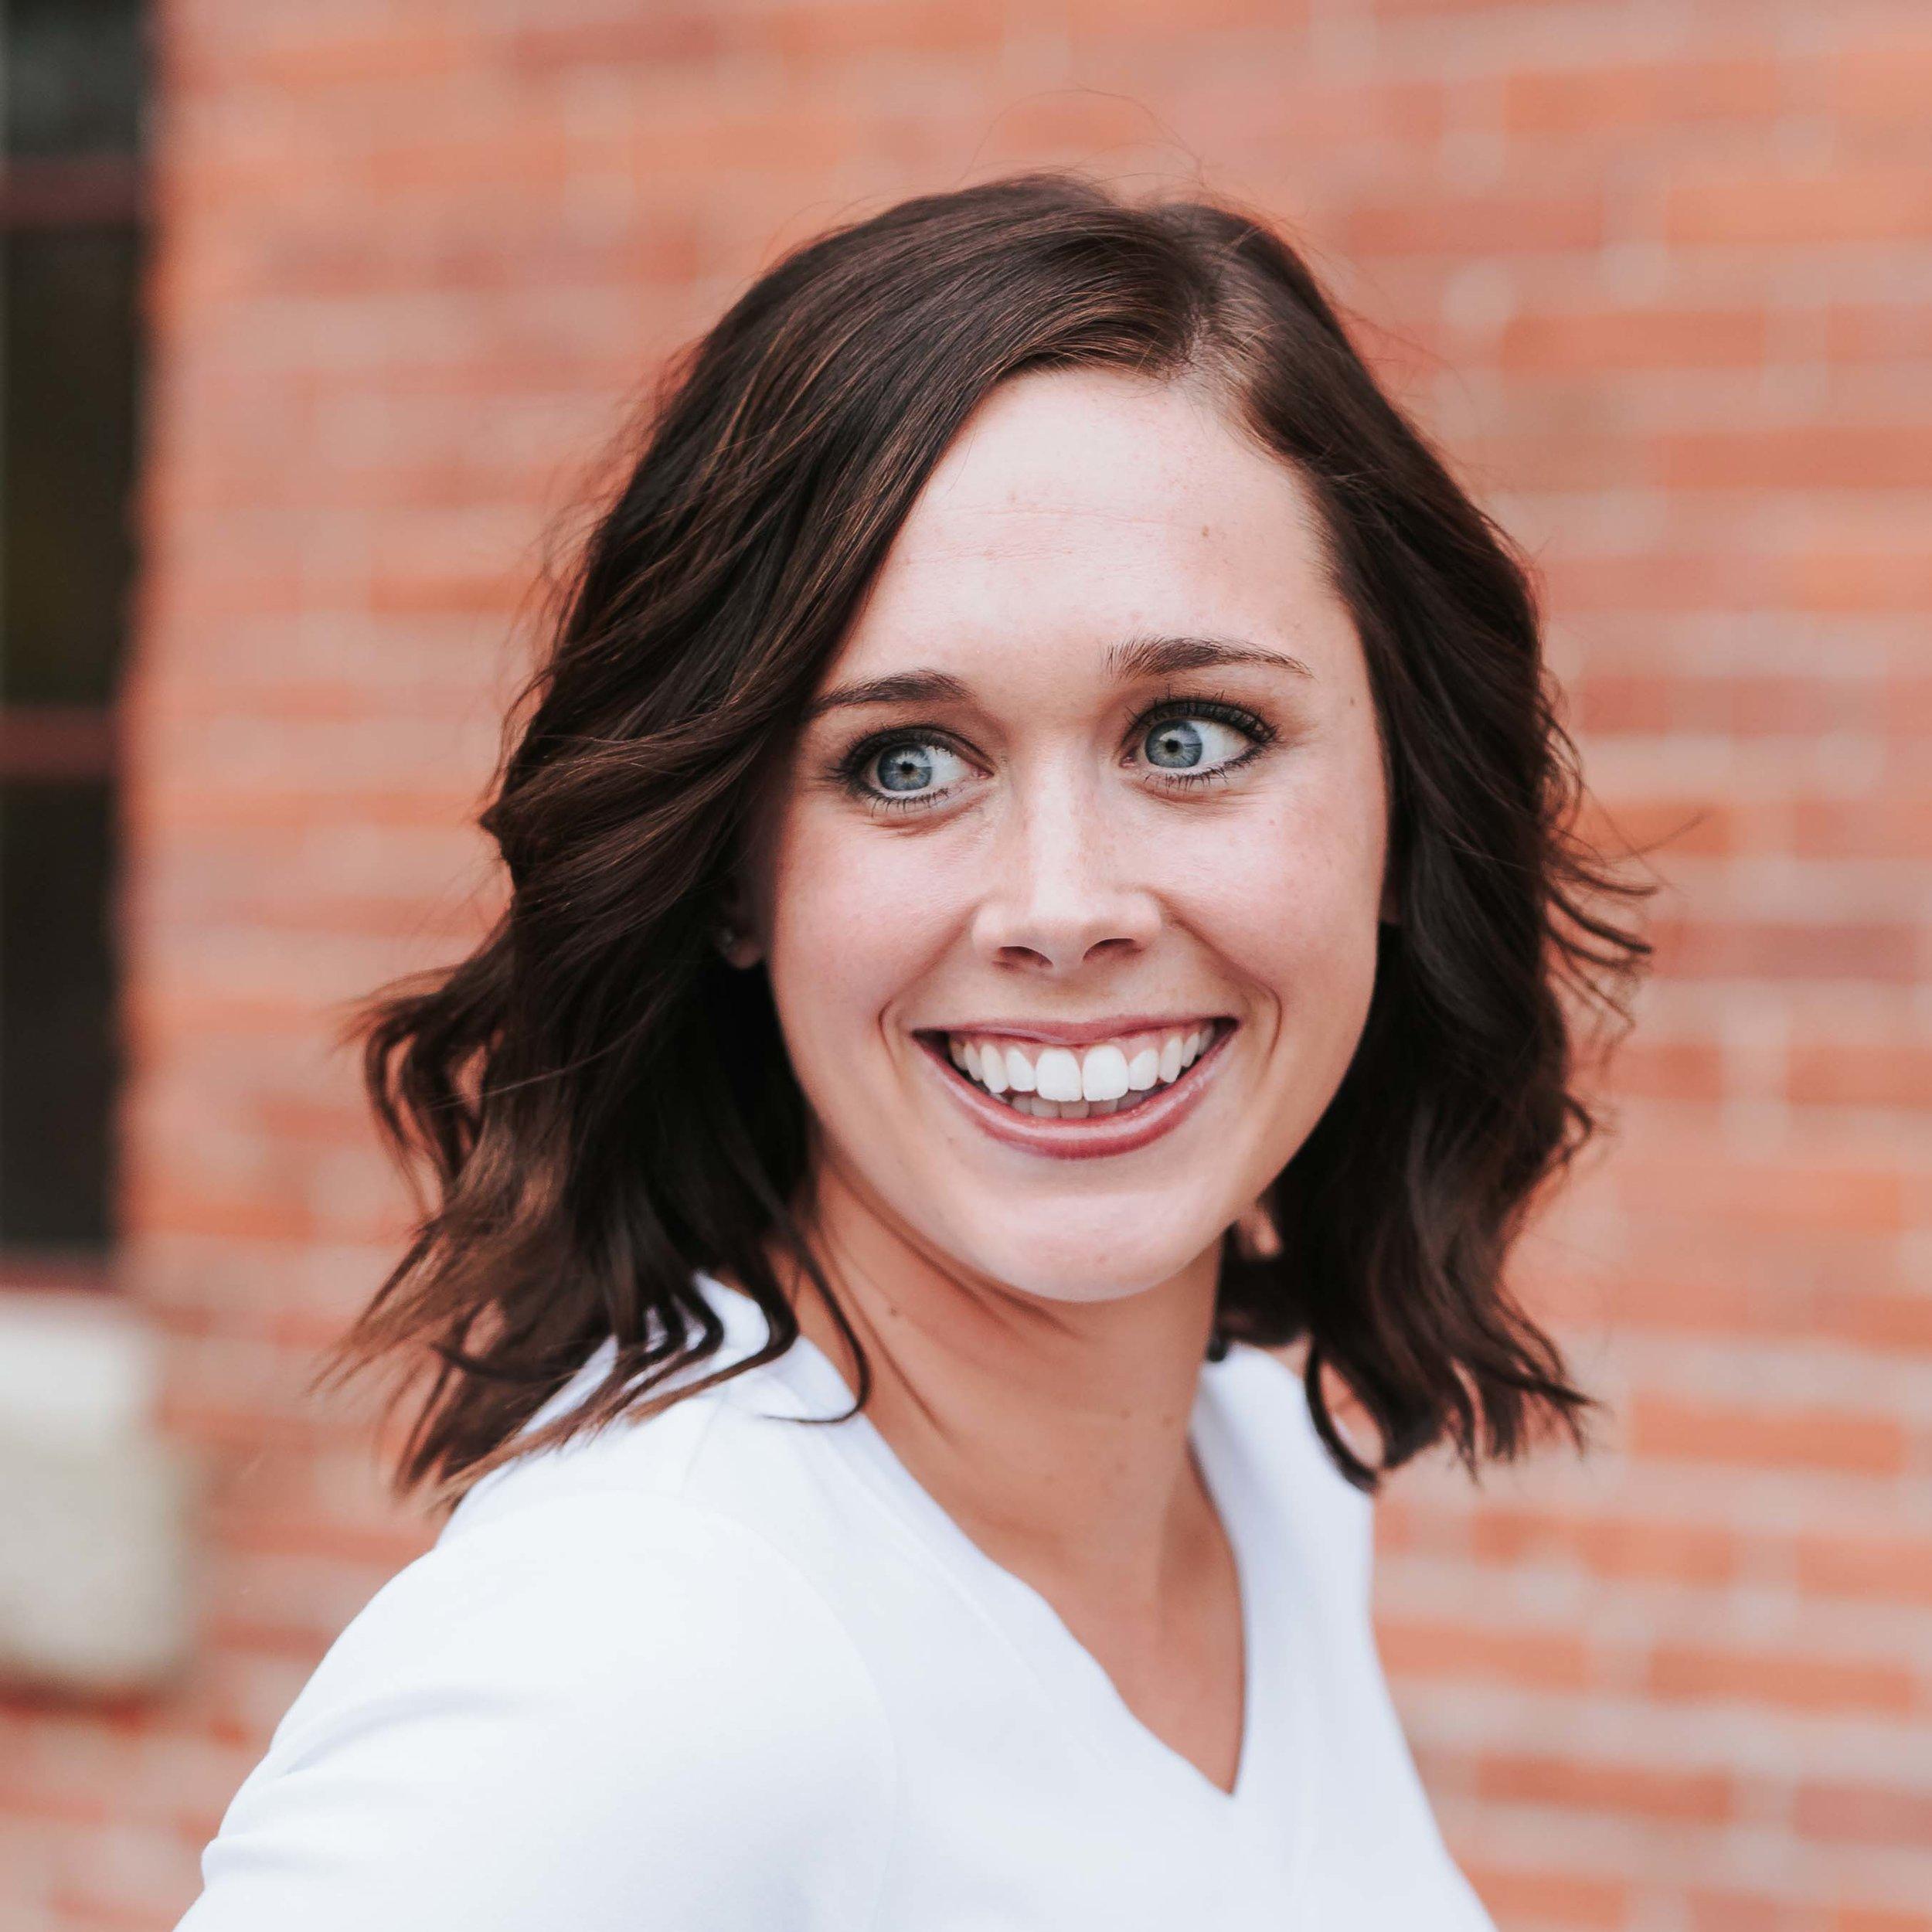 Amy Levesque Fields of Hub Digital Marketing is an online and digital expert in Rhode Island.